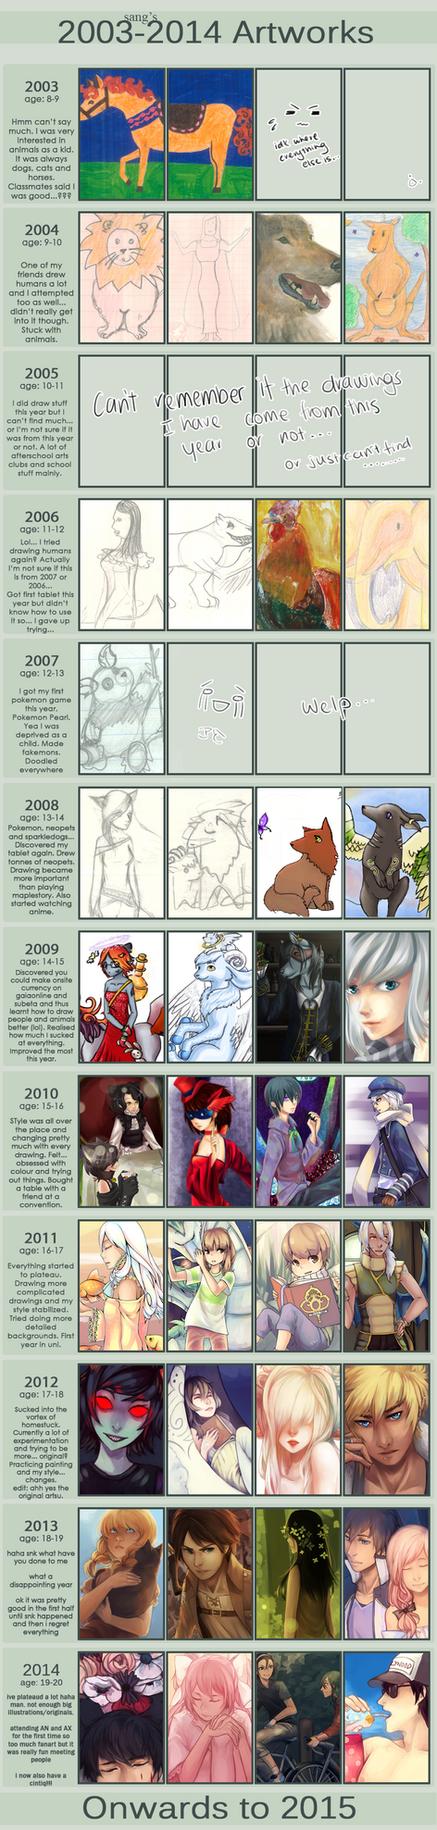 Improvement Meme 2003-2014 by Sangcoon